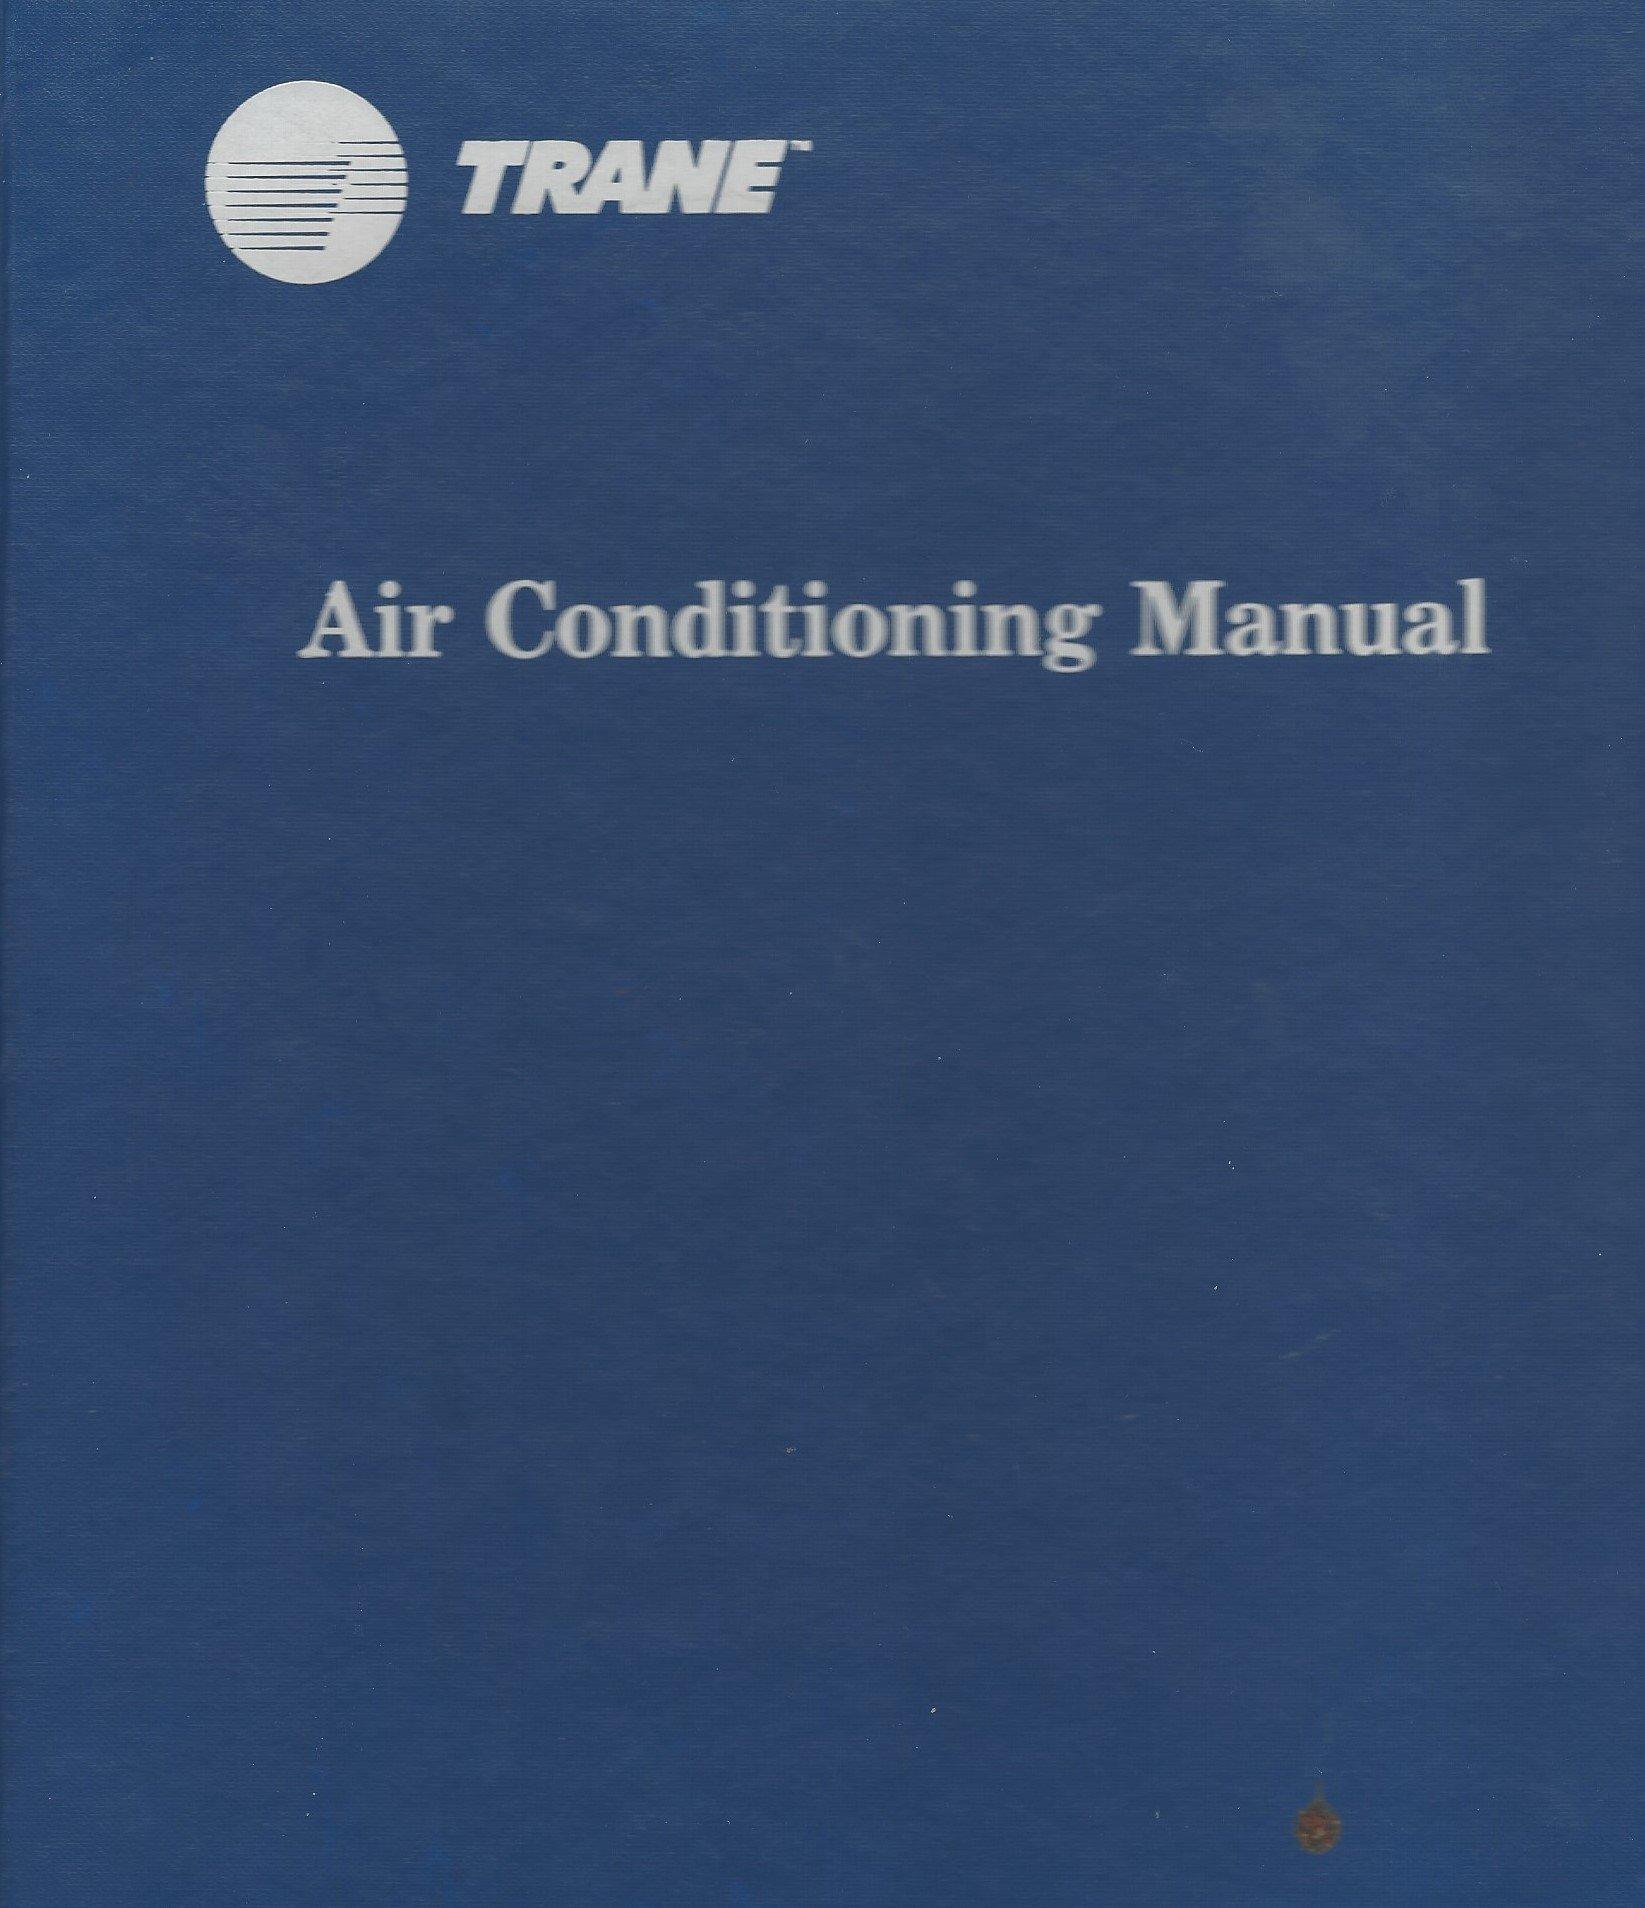 Trane Air Conditioning Manual Pdf